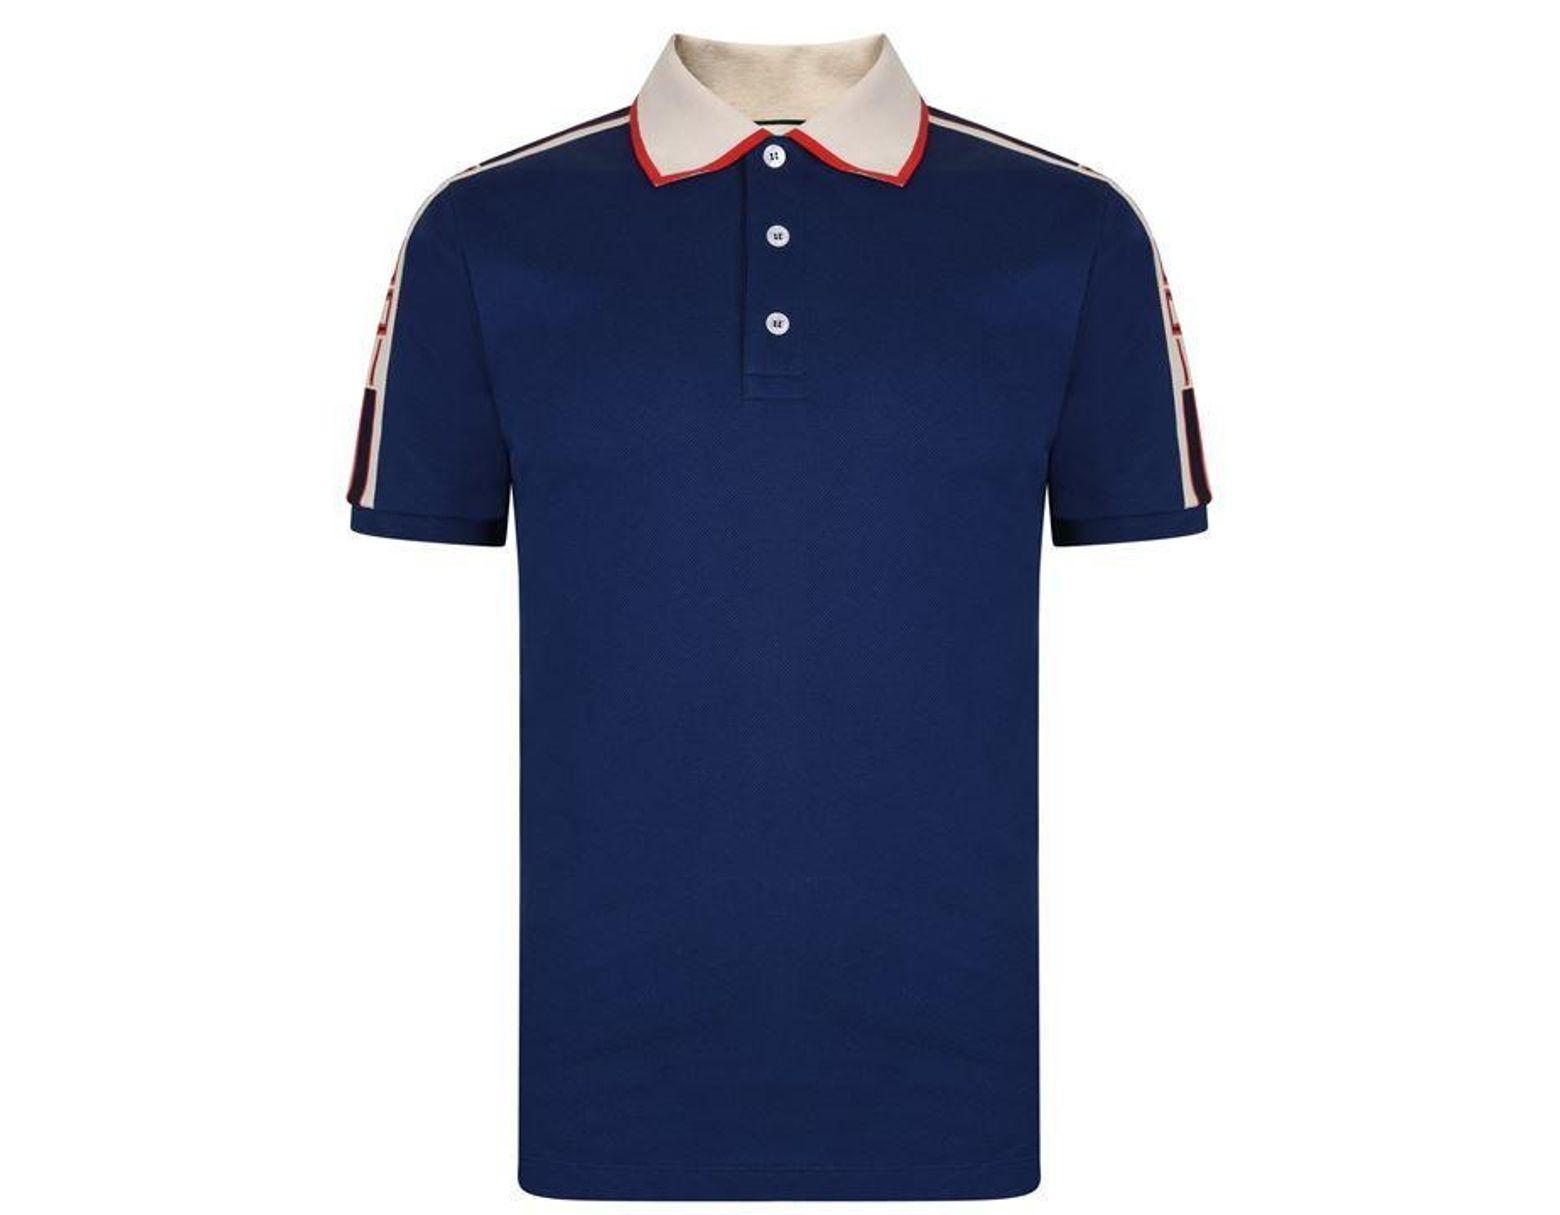 63abeb57c Gucci Ribbon Polo Shirt in Blue for Men - Lyst